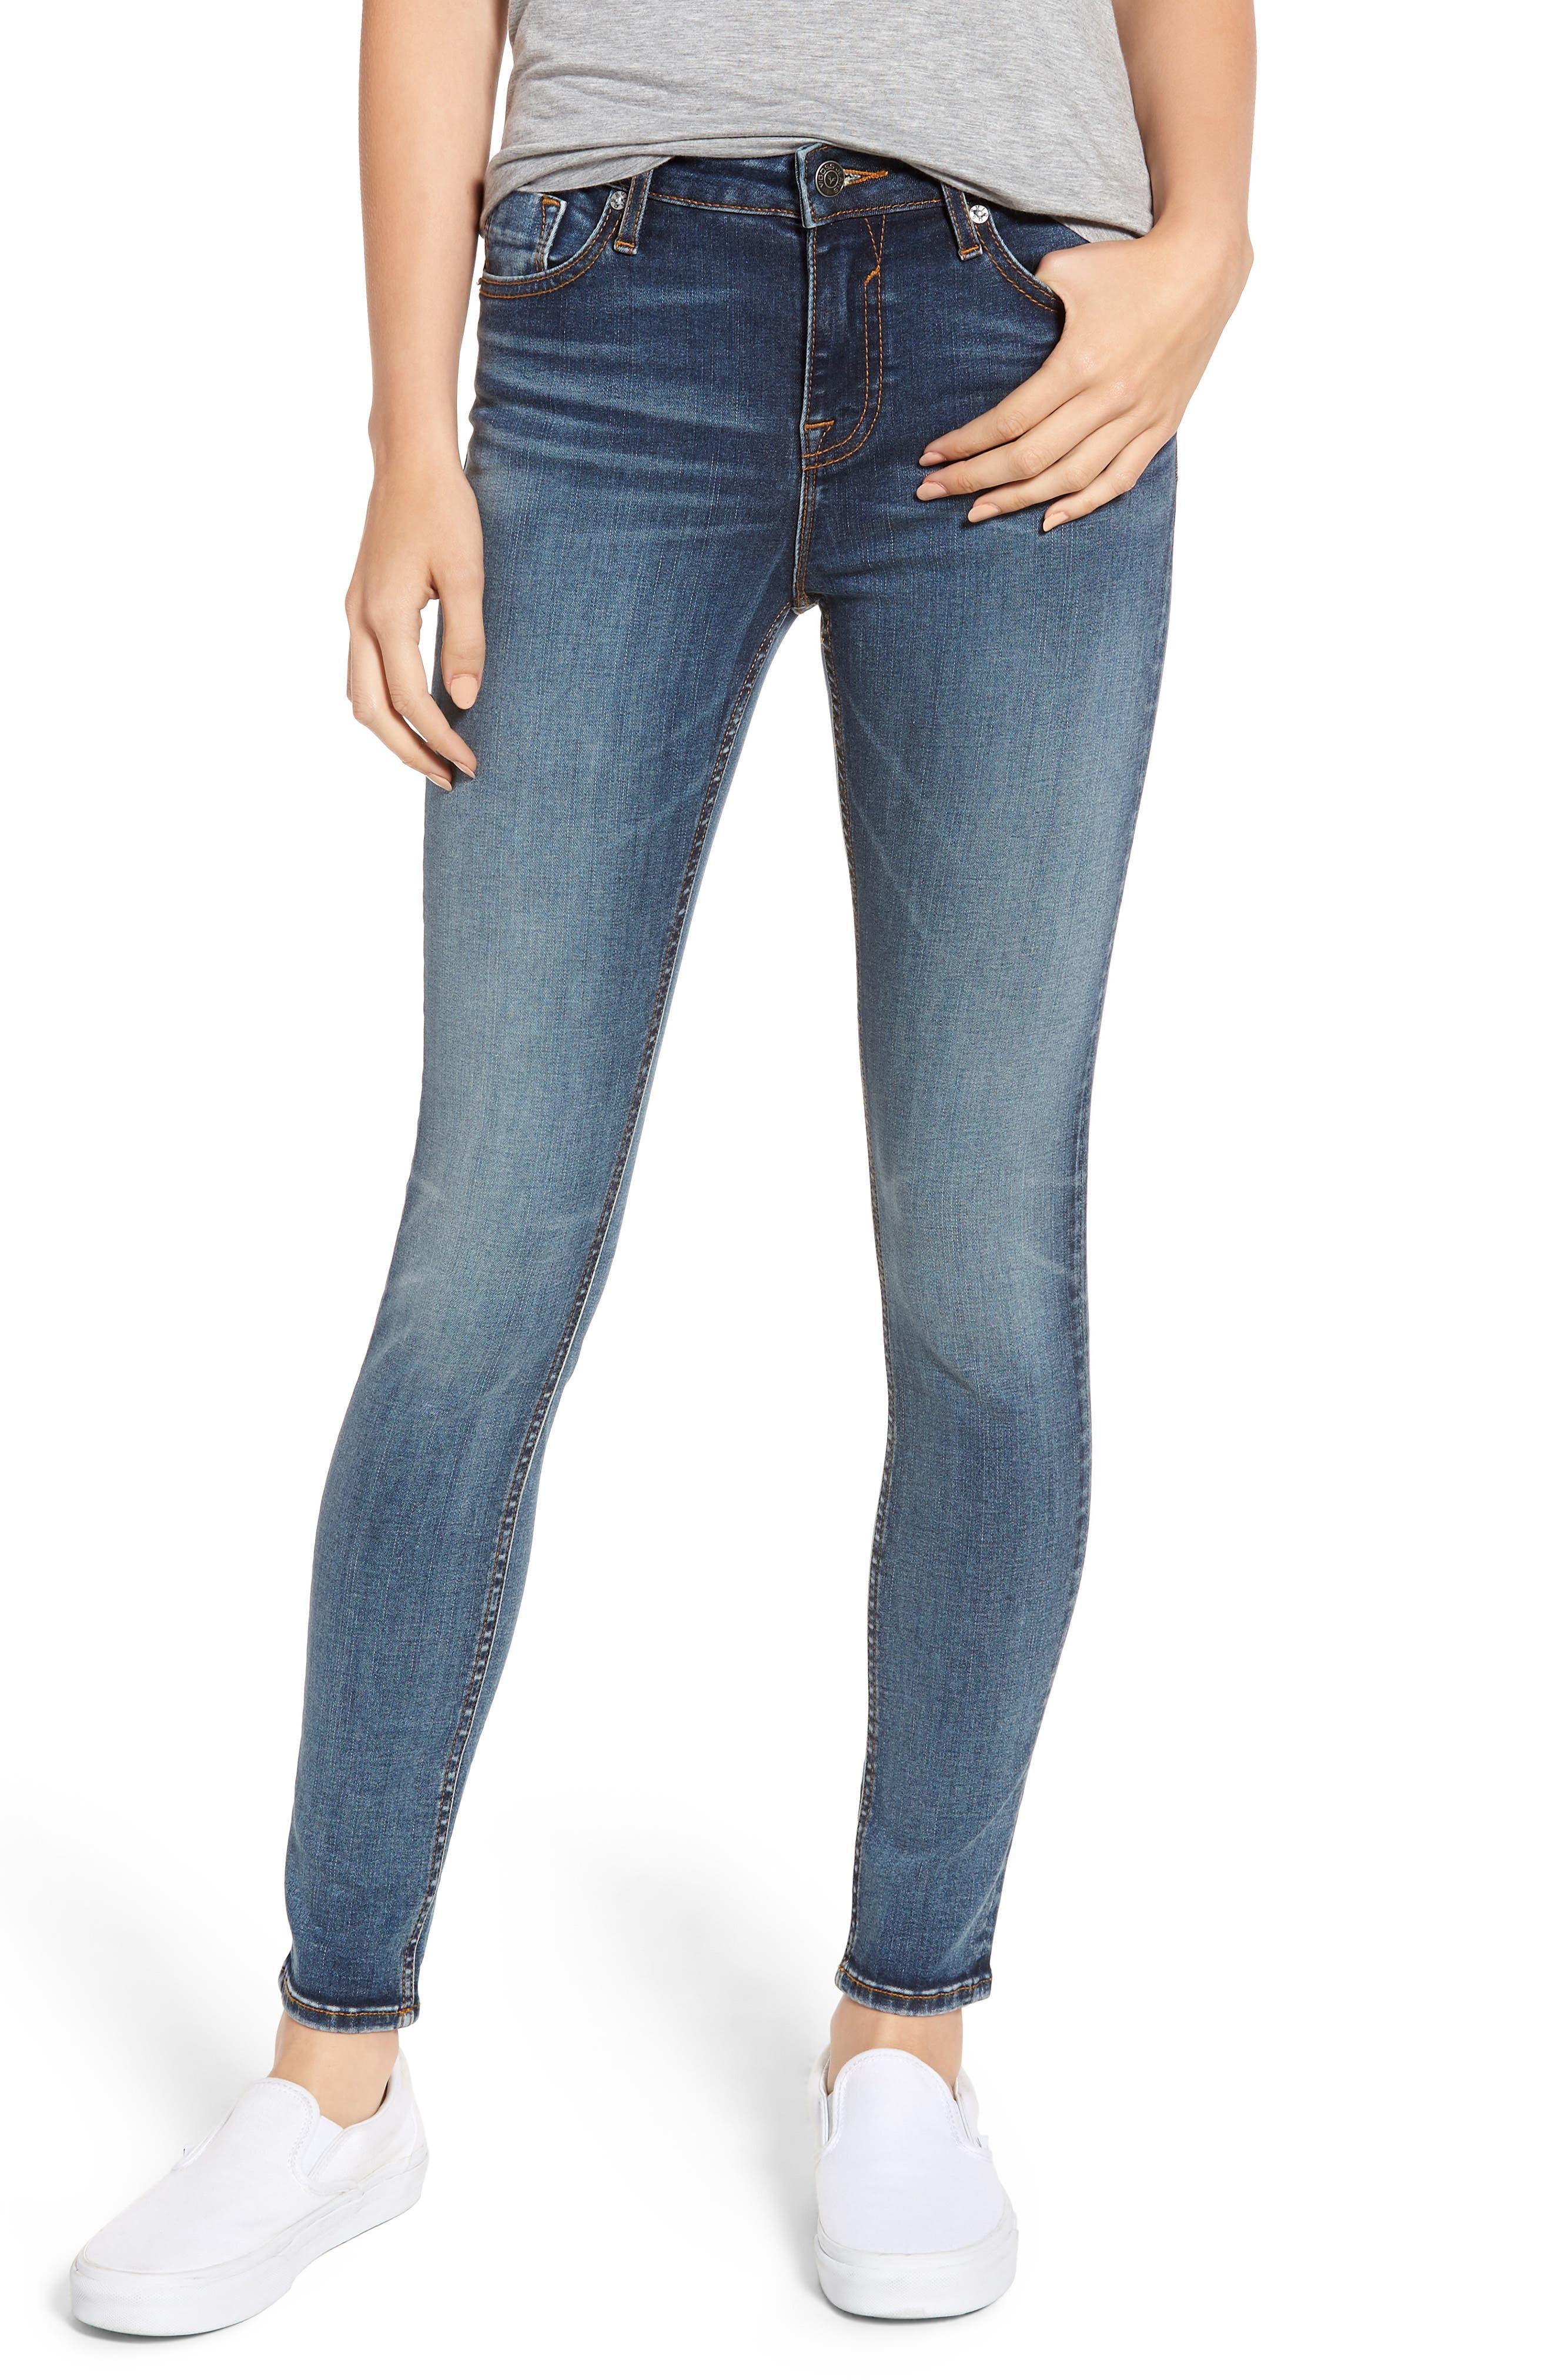 Marley Skinny Jeans,                             Main thumbnail 1, color,                             MED WASH